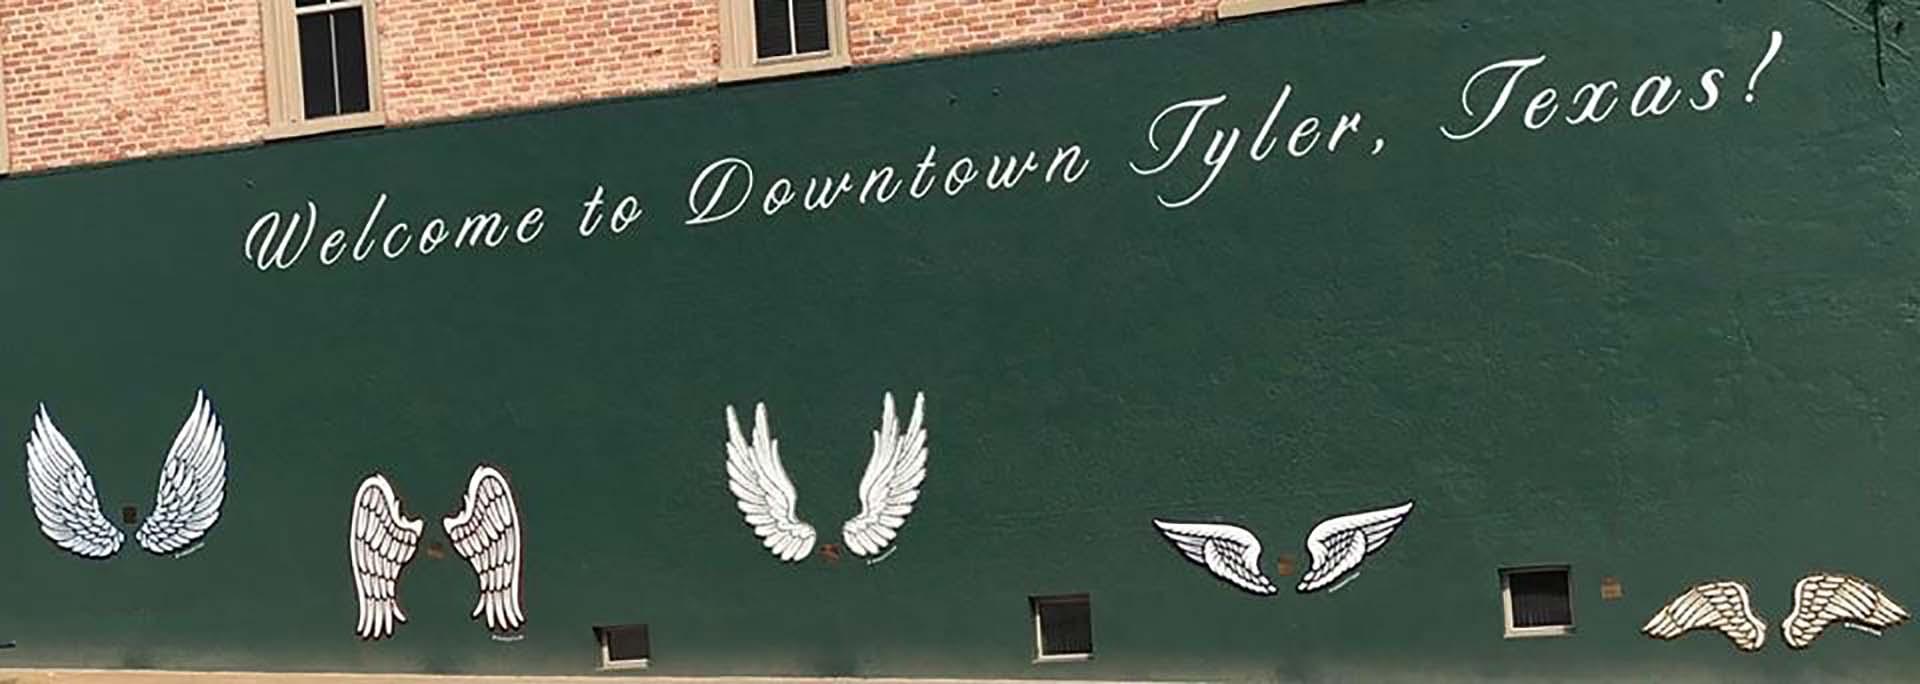 wings mural - wings of Tyler - custom mural - mural - Dace Kidd - Mural Artist Tx